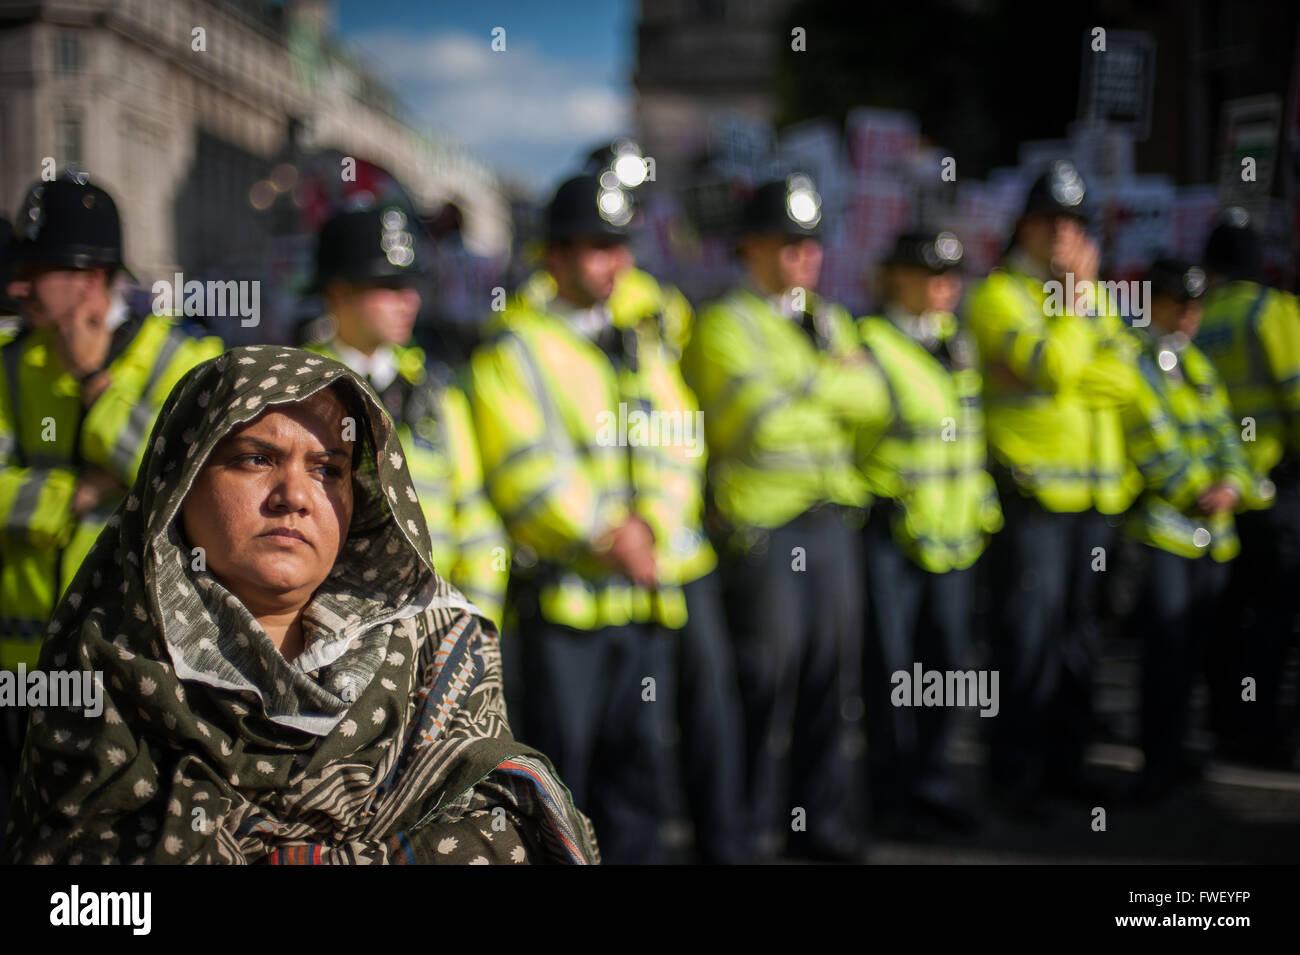 Demonstrant gegen pro-israelische BBC Bias, 15. Juli 2014, London Stockbild